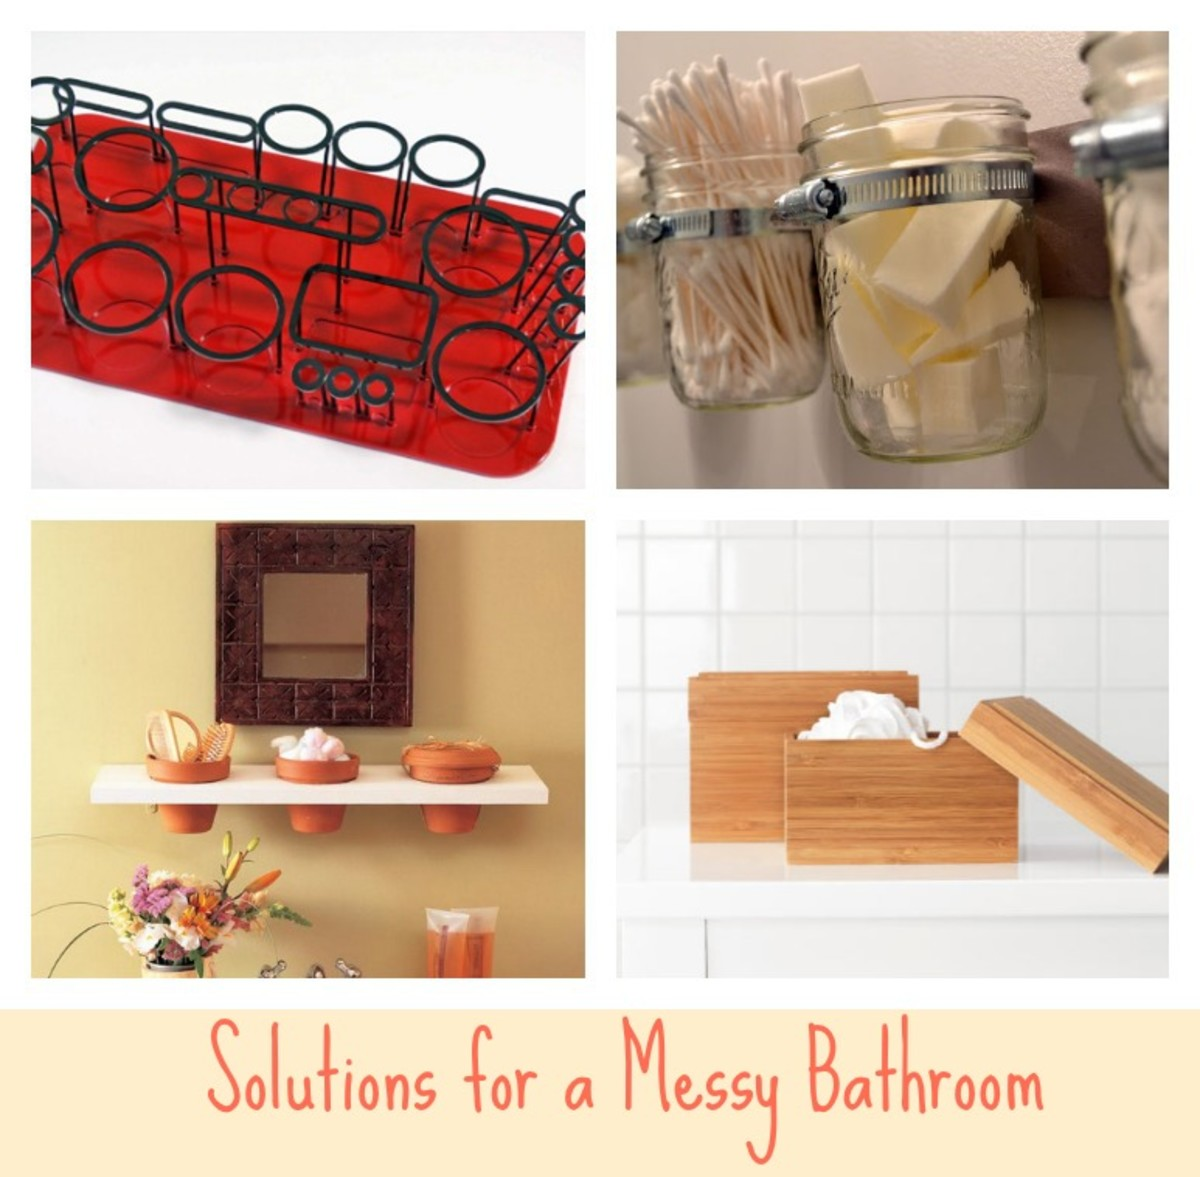 Messy Bathroom: Solutions For A Messy Bathroom